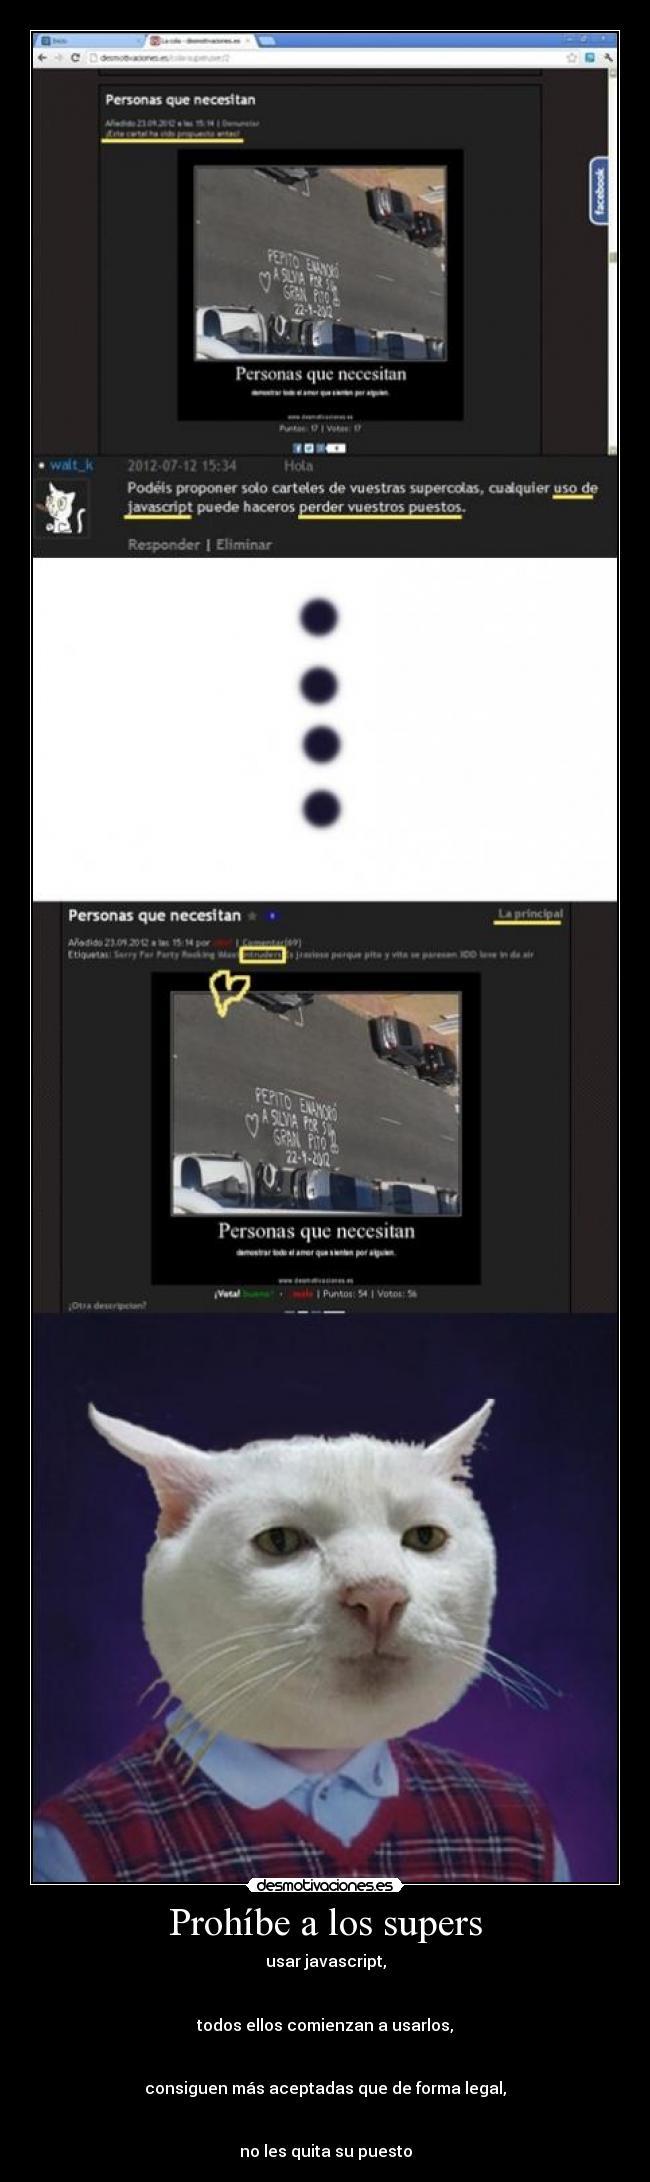 http://img.desmotivaciones.es/201209/catsnuyggyu.jpg